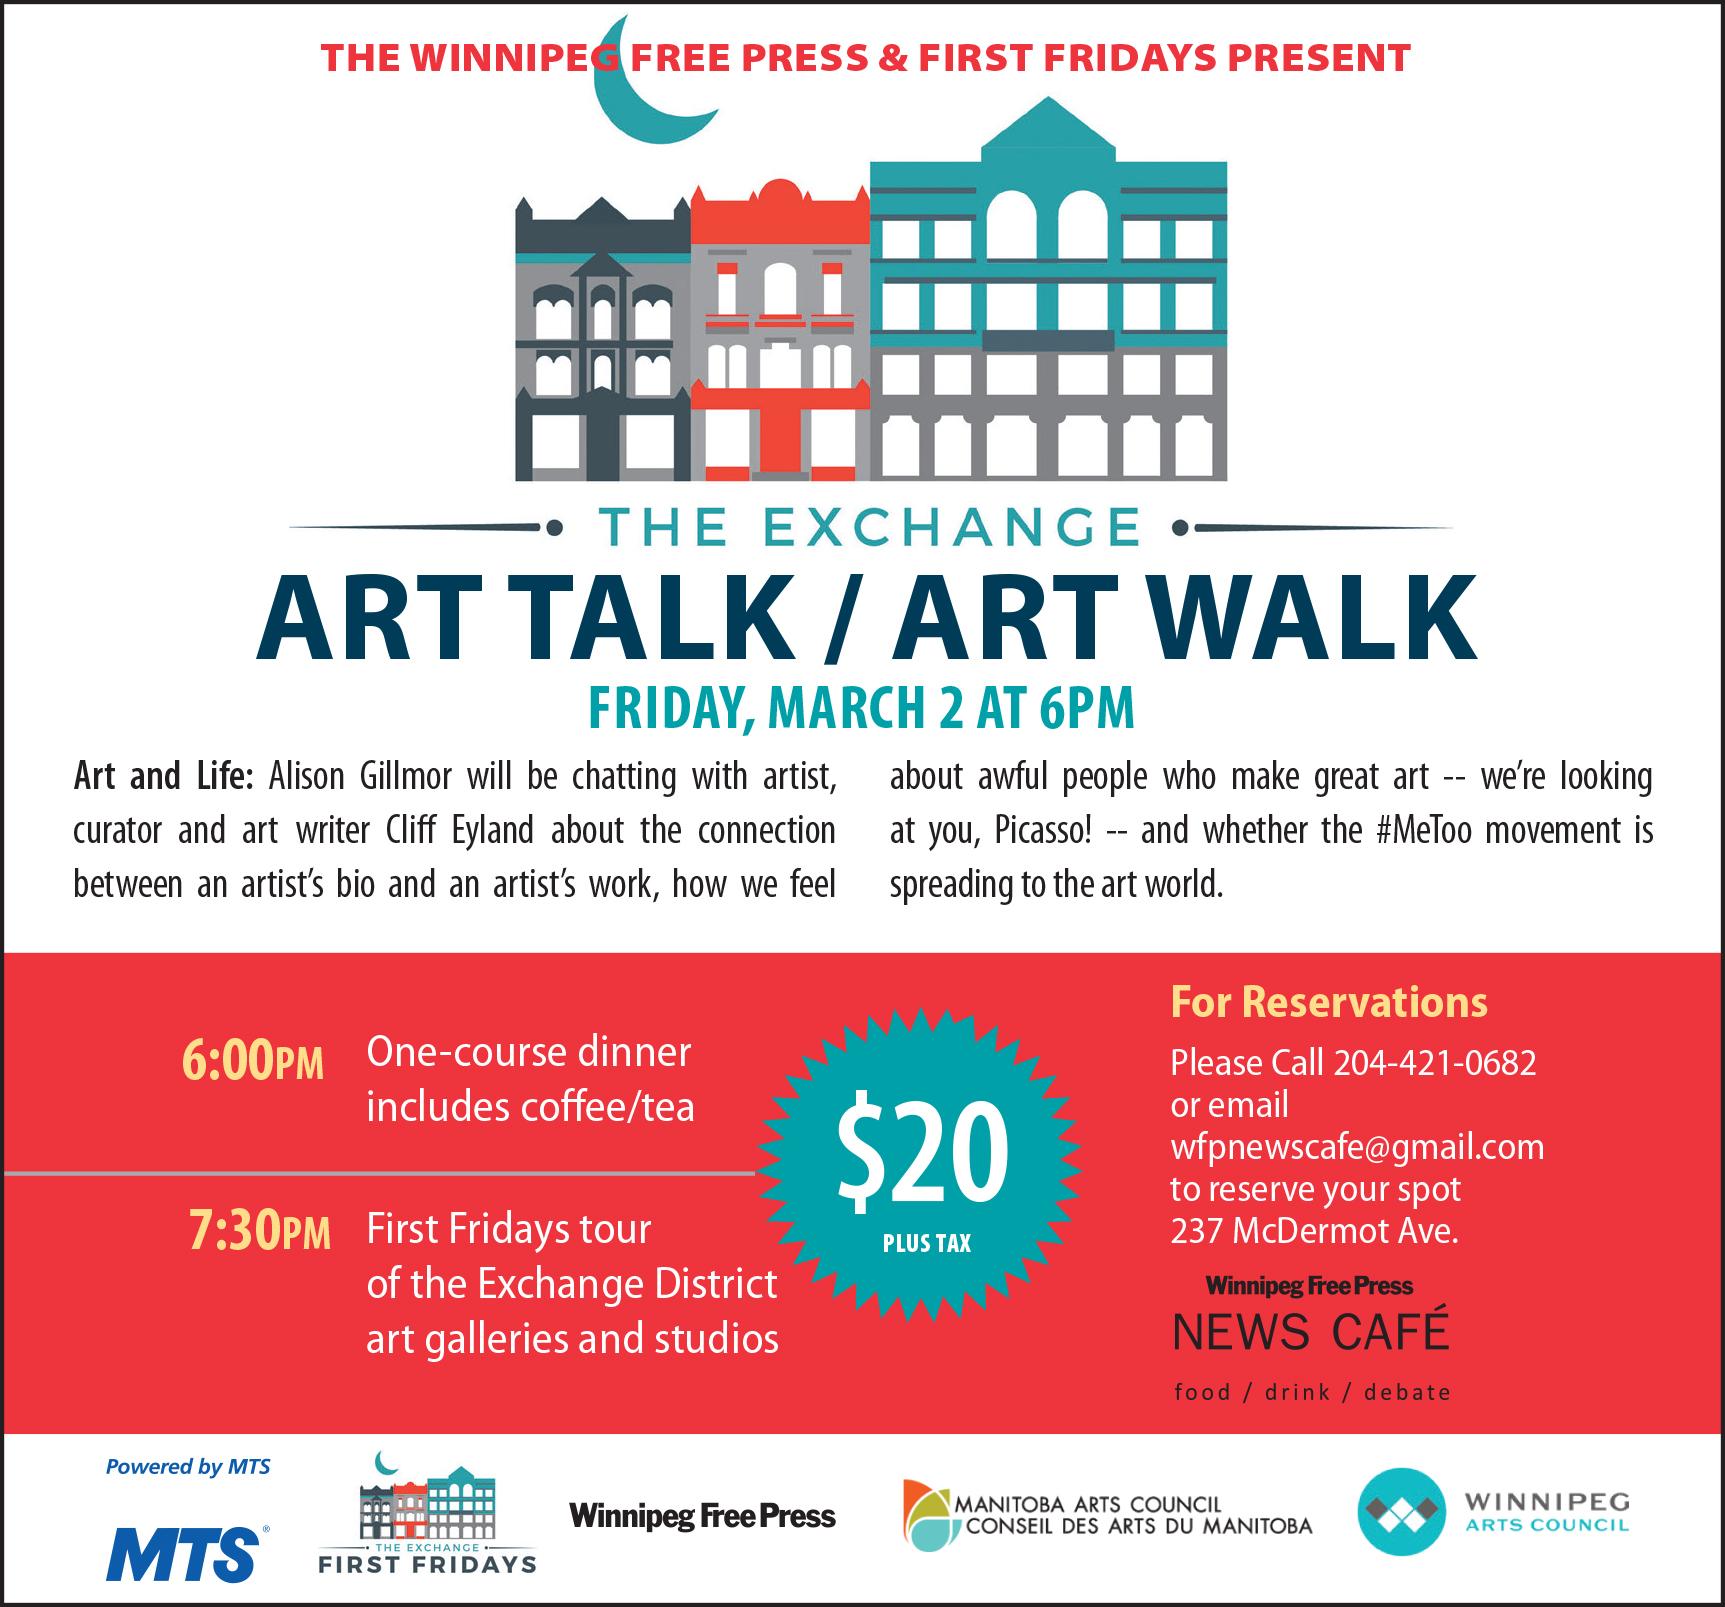 ART TALK/ART WALK: ART and LIFE - The Exchange District BIZ